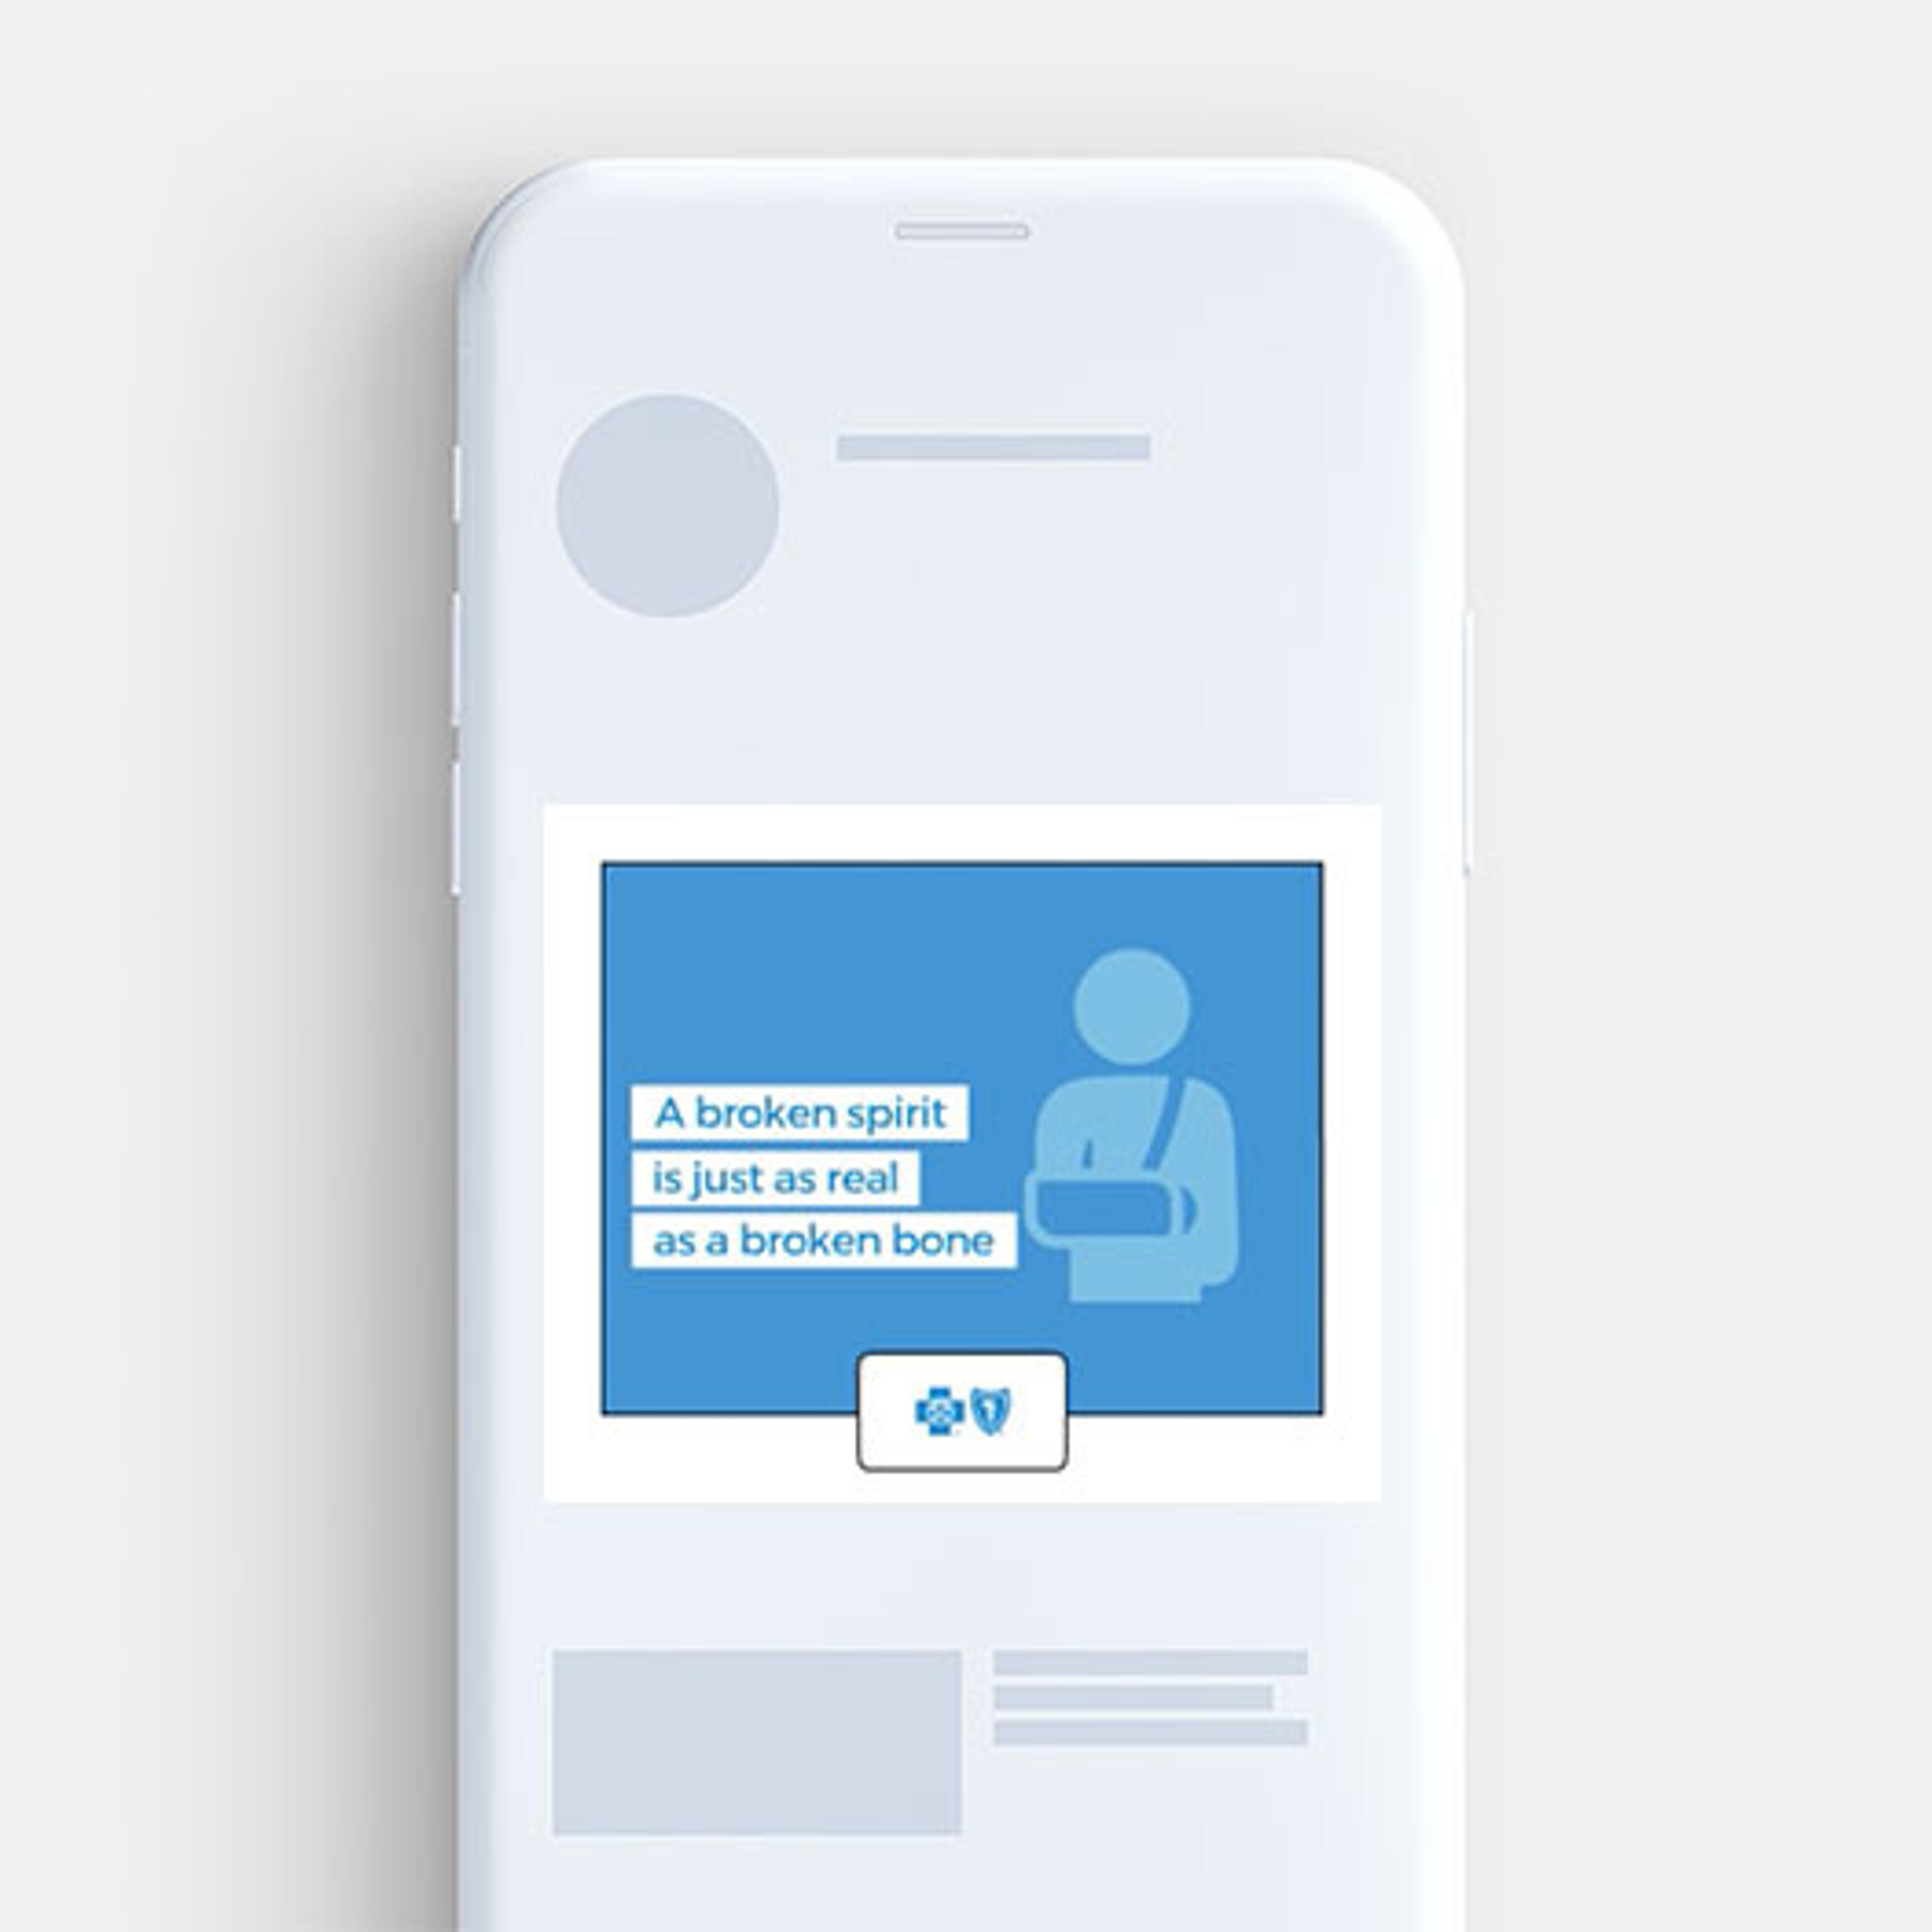 Blue Cross Blue Shield digital banner on mobile phone promoting awareness around stigma